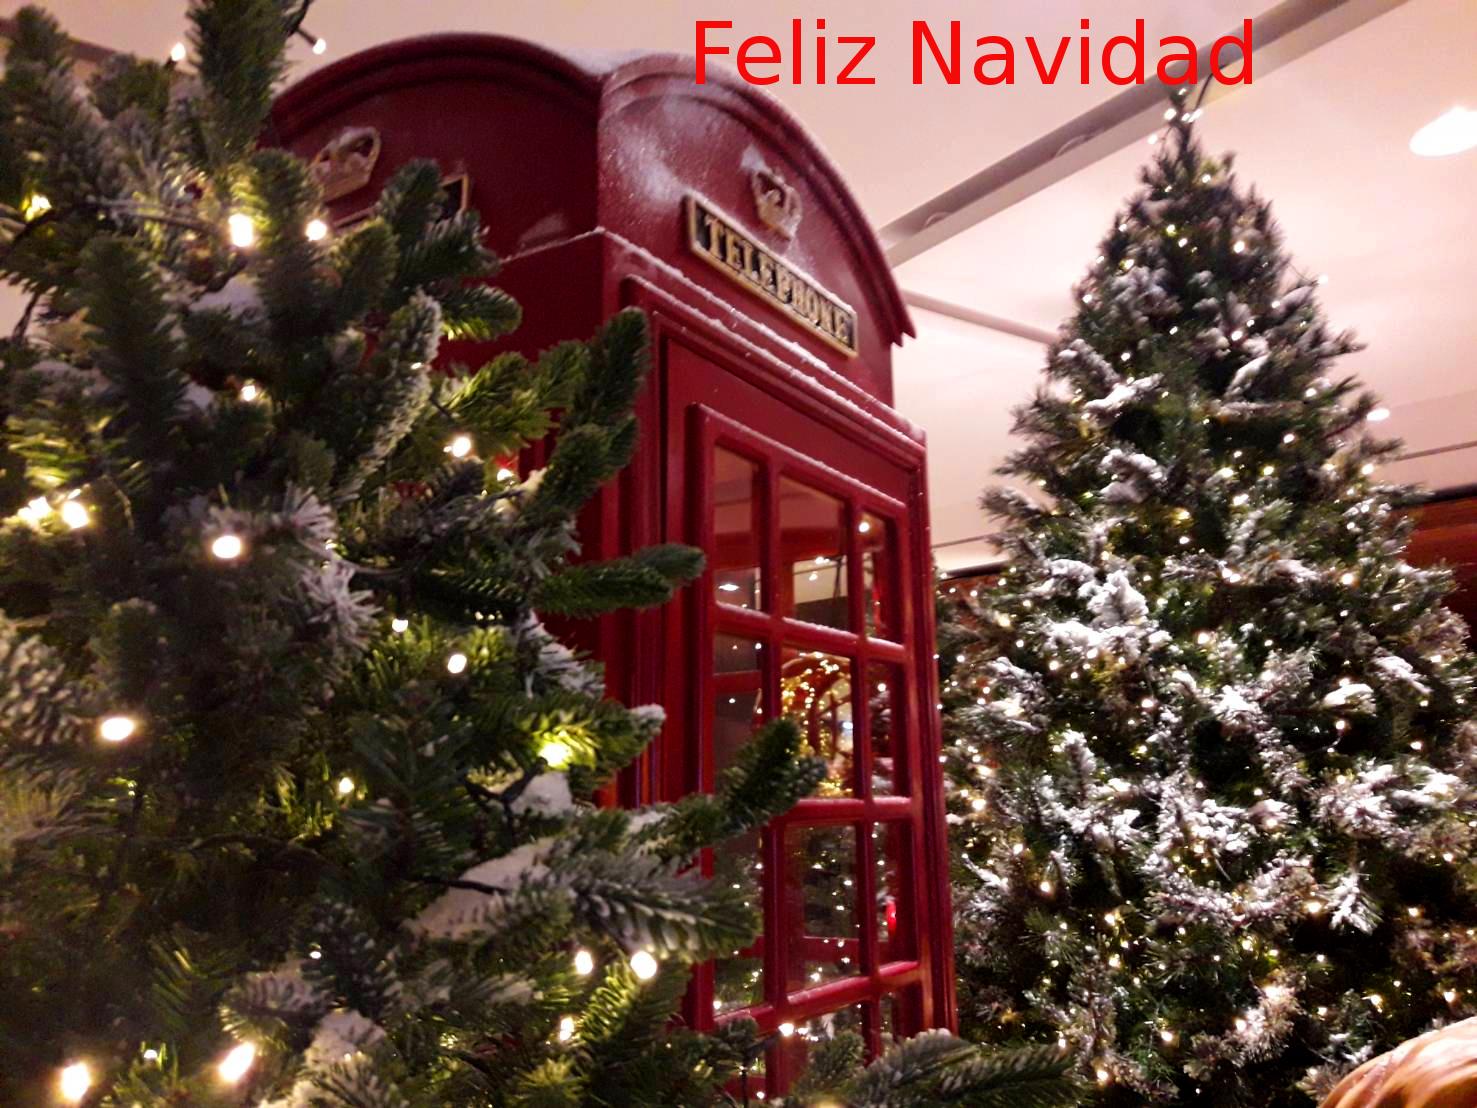 1. feliz navidad